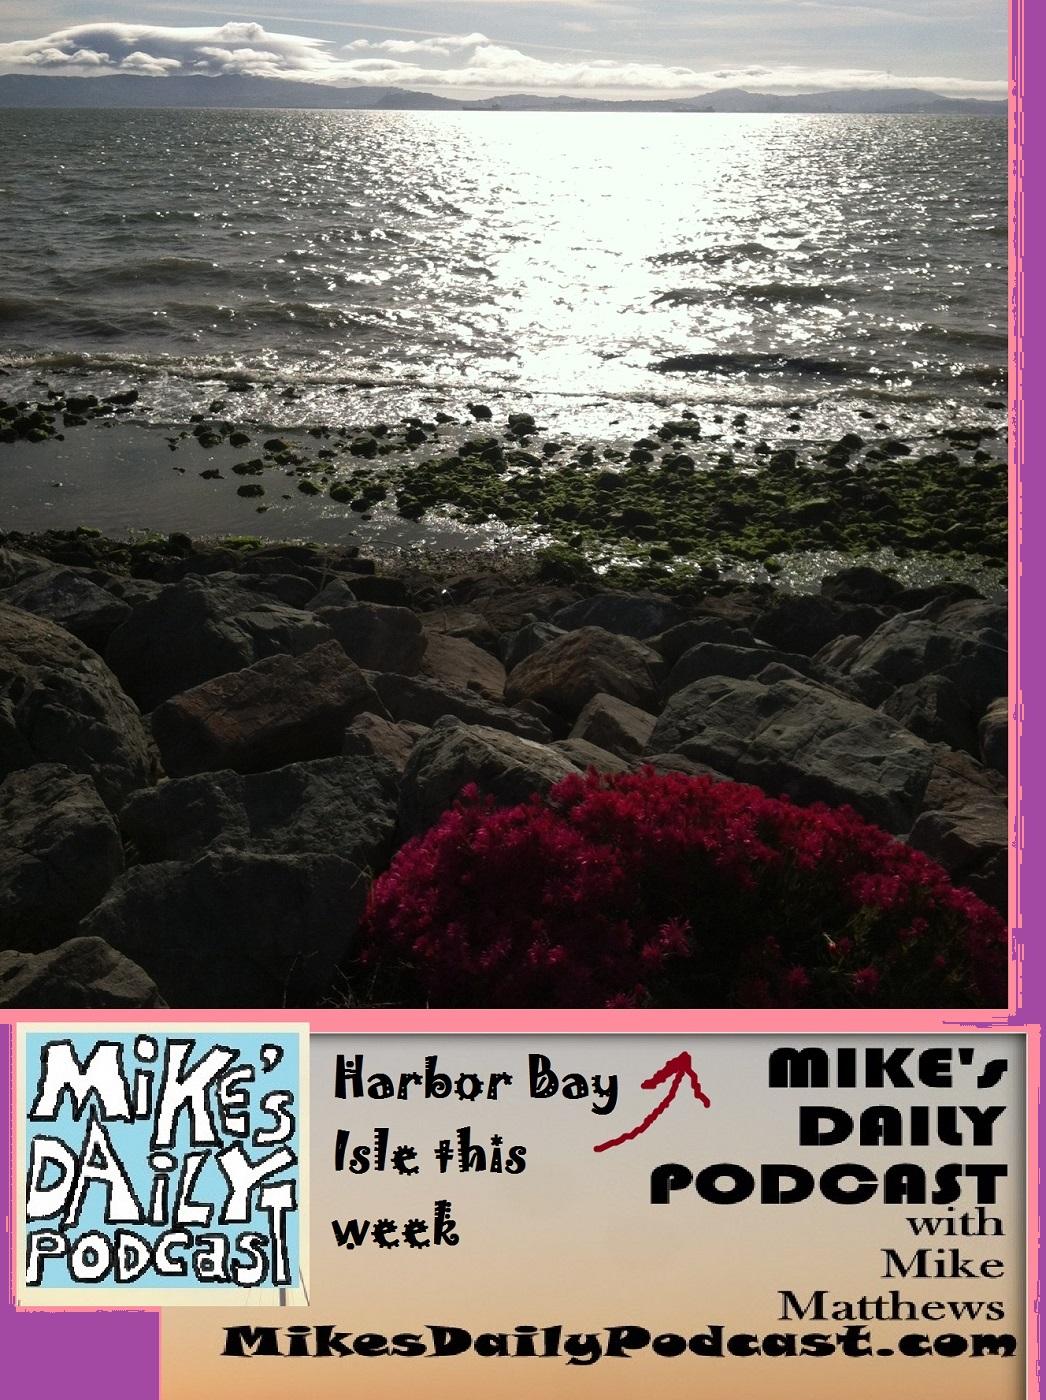 MIKEs DAILY PODCAST 1079 Harbor Bay Isle Alameda CA